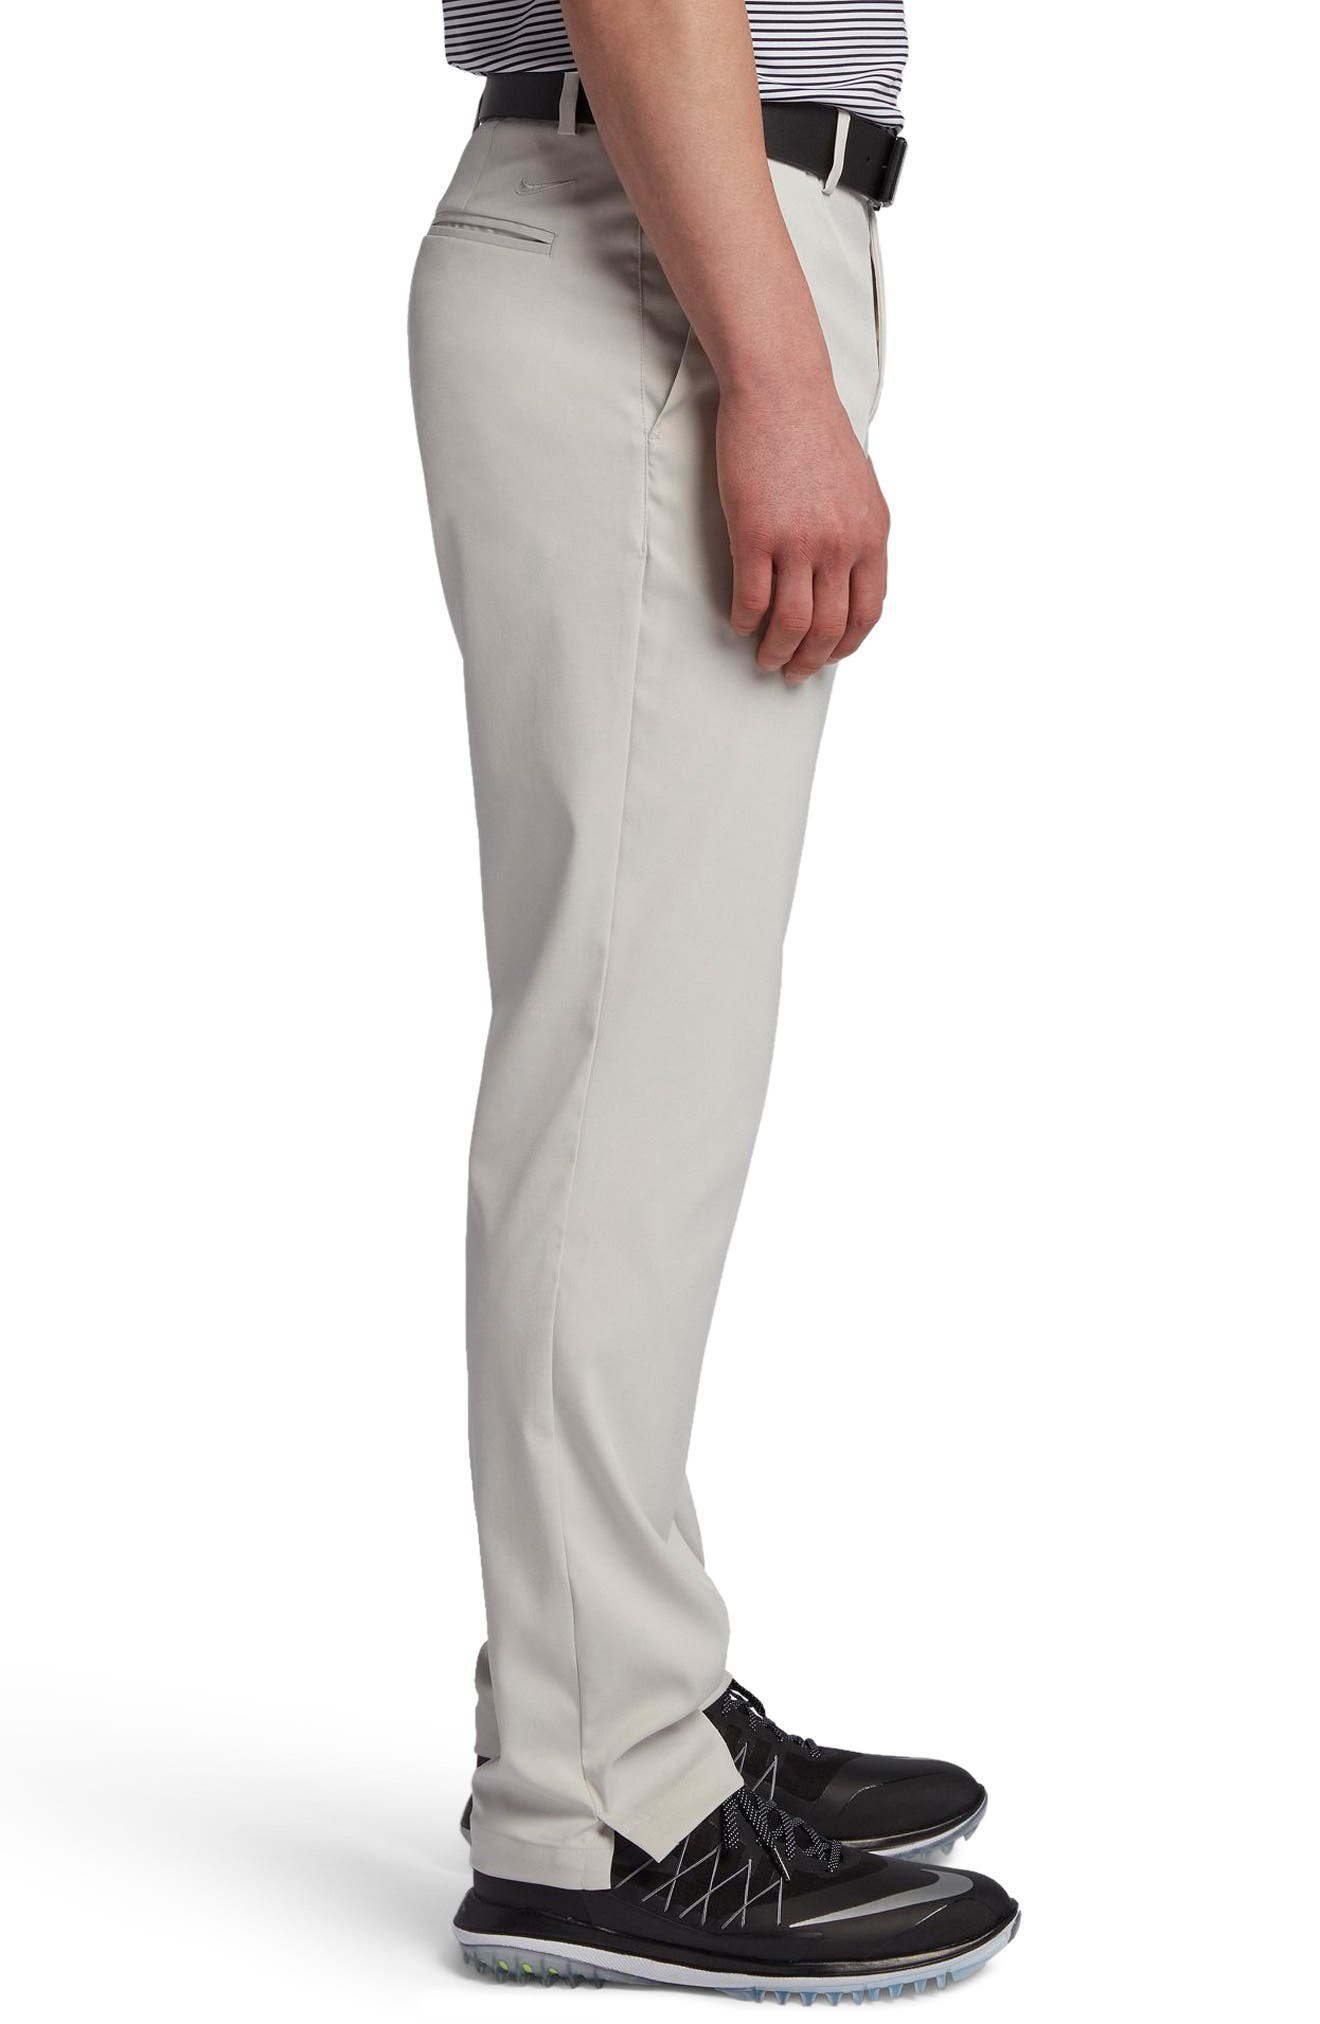 Flat Front Dri-FIT Tech Golf Pants,                             Alternate thumbnail 3, color,                             LIGHT BONE/ LIGHT BONE